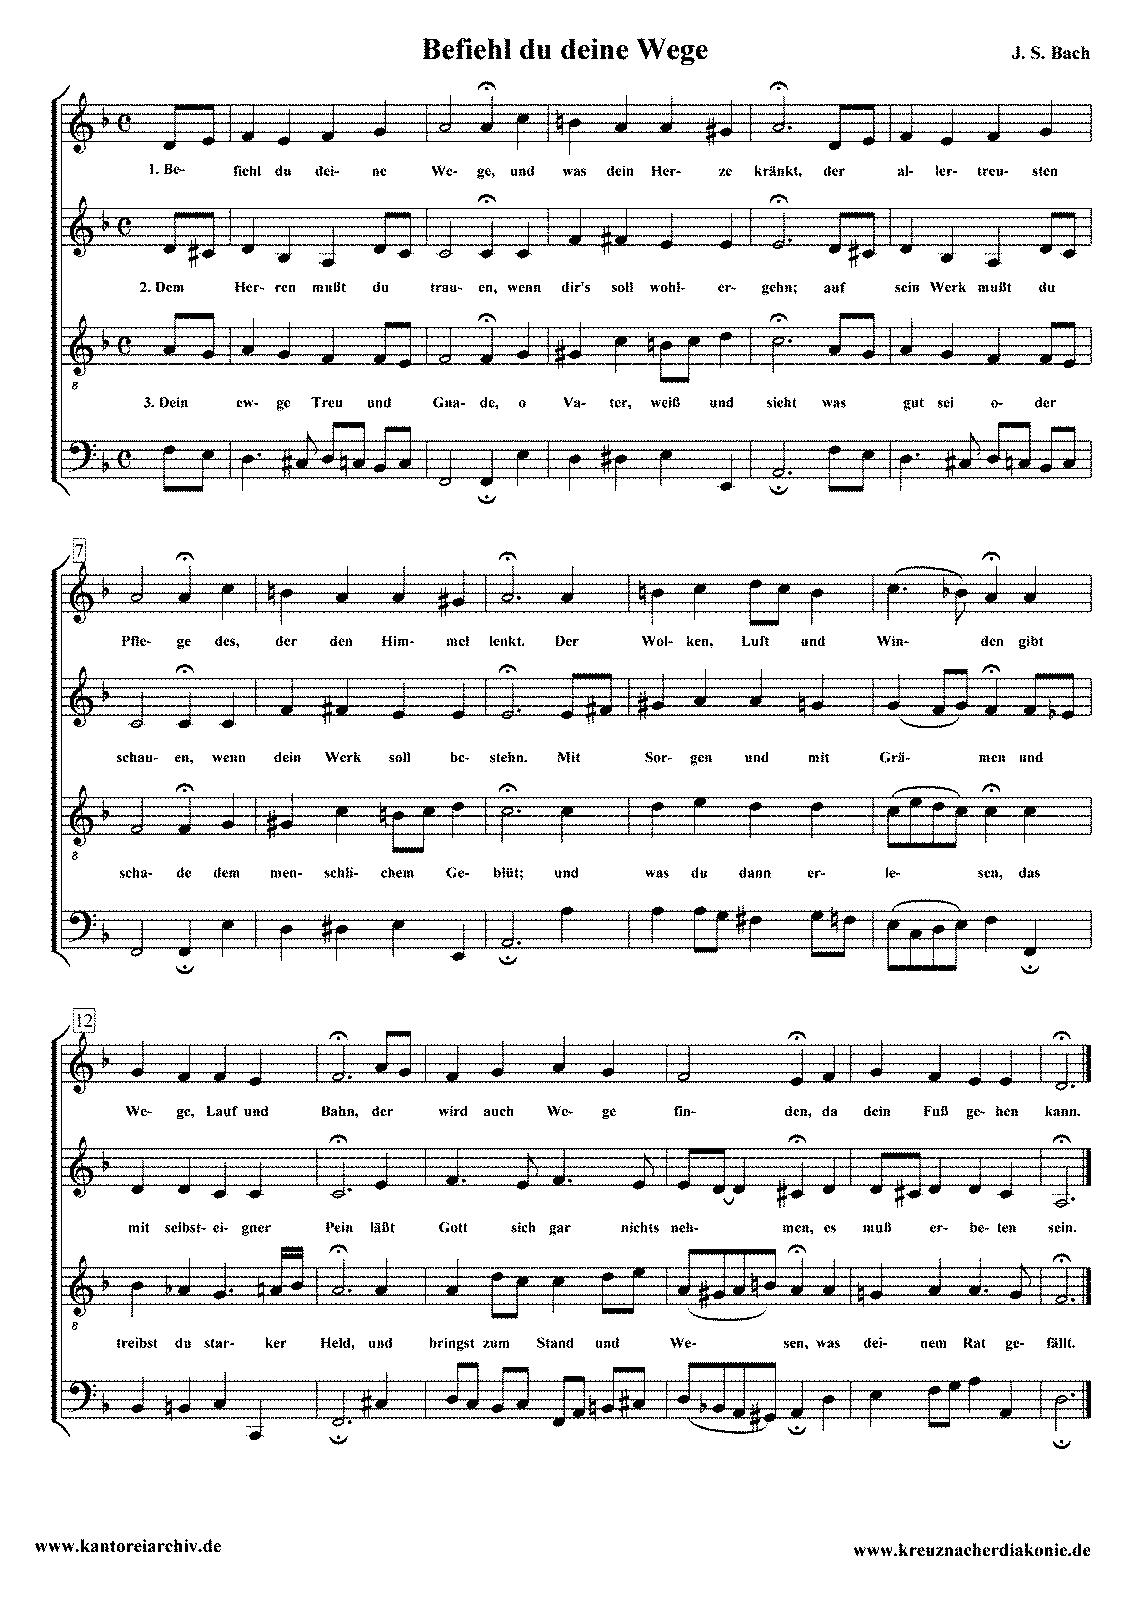 Chorale Harmonisations, BWV 1-438 (Bach, Johann Sebastian) - IMSLP ...